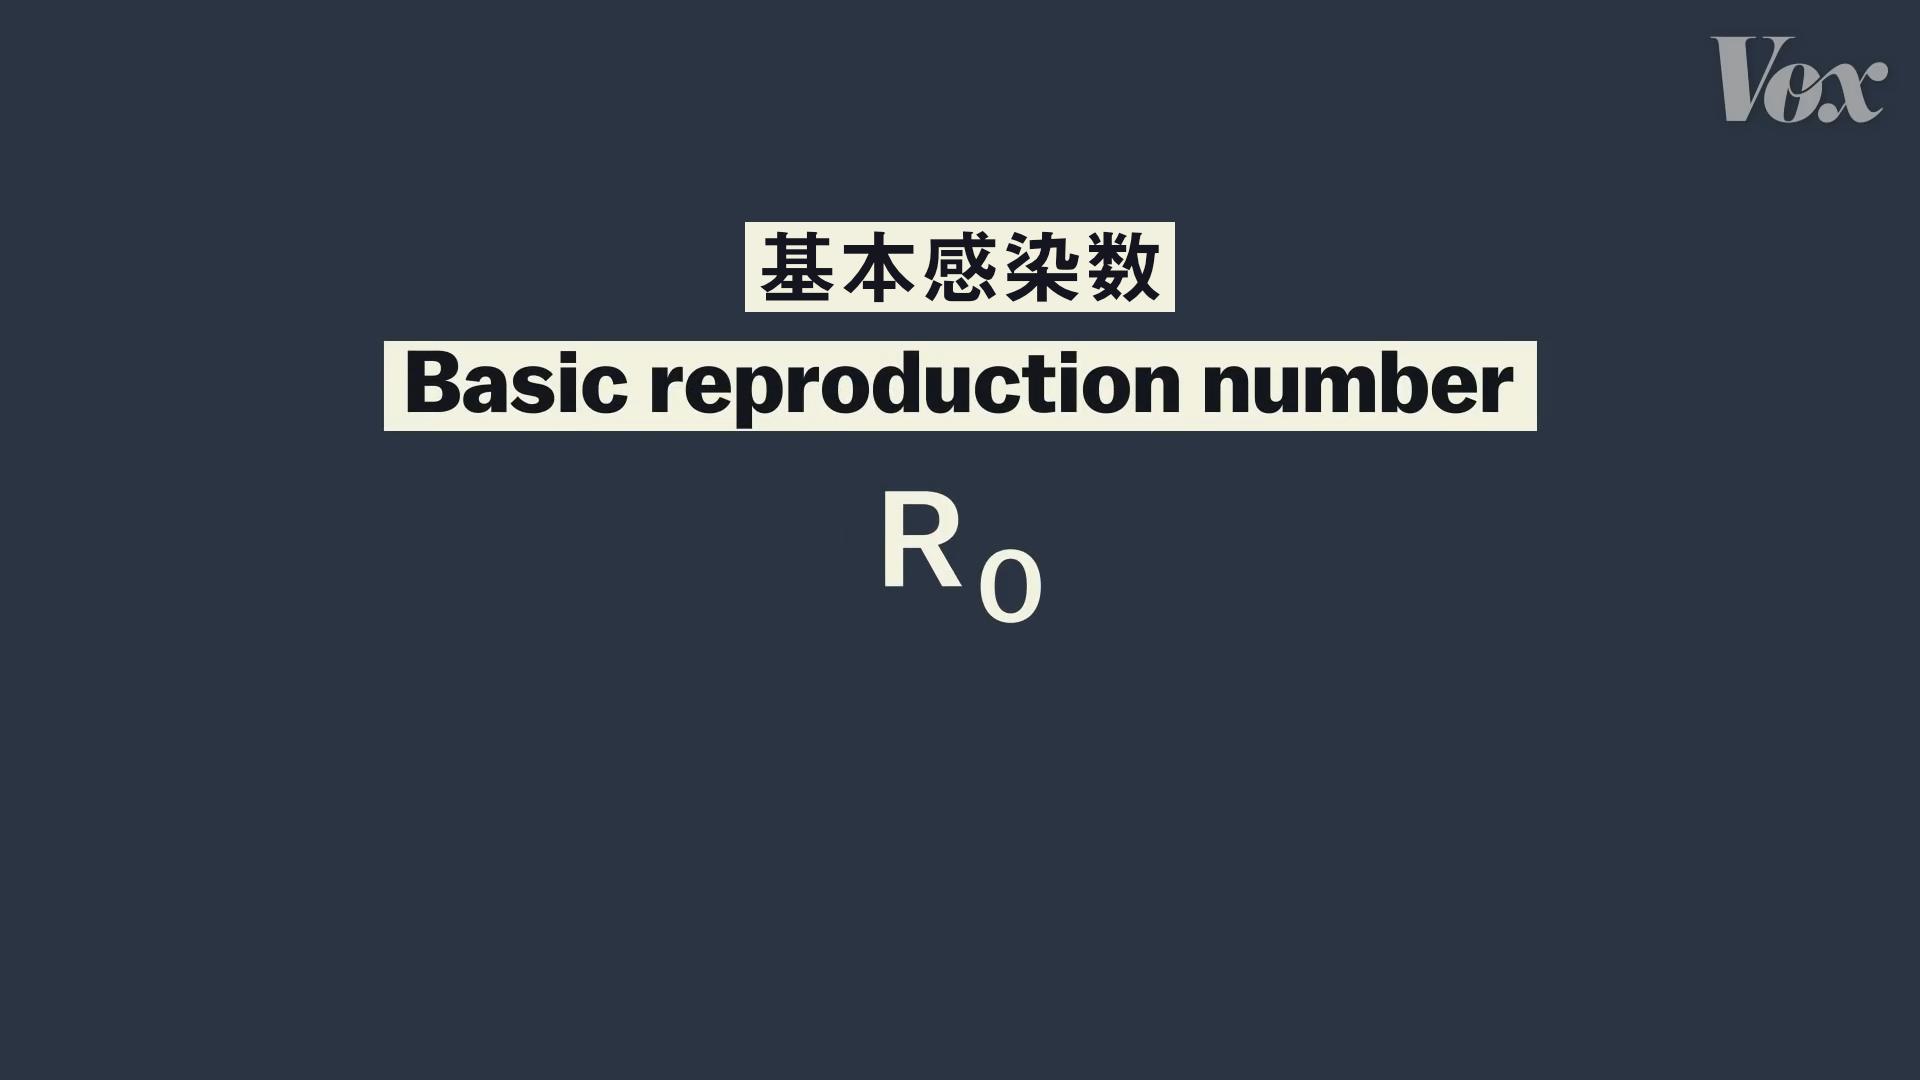 f:id:Imamura:20200408133025p:plain